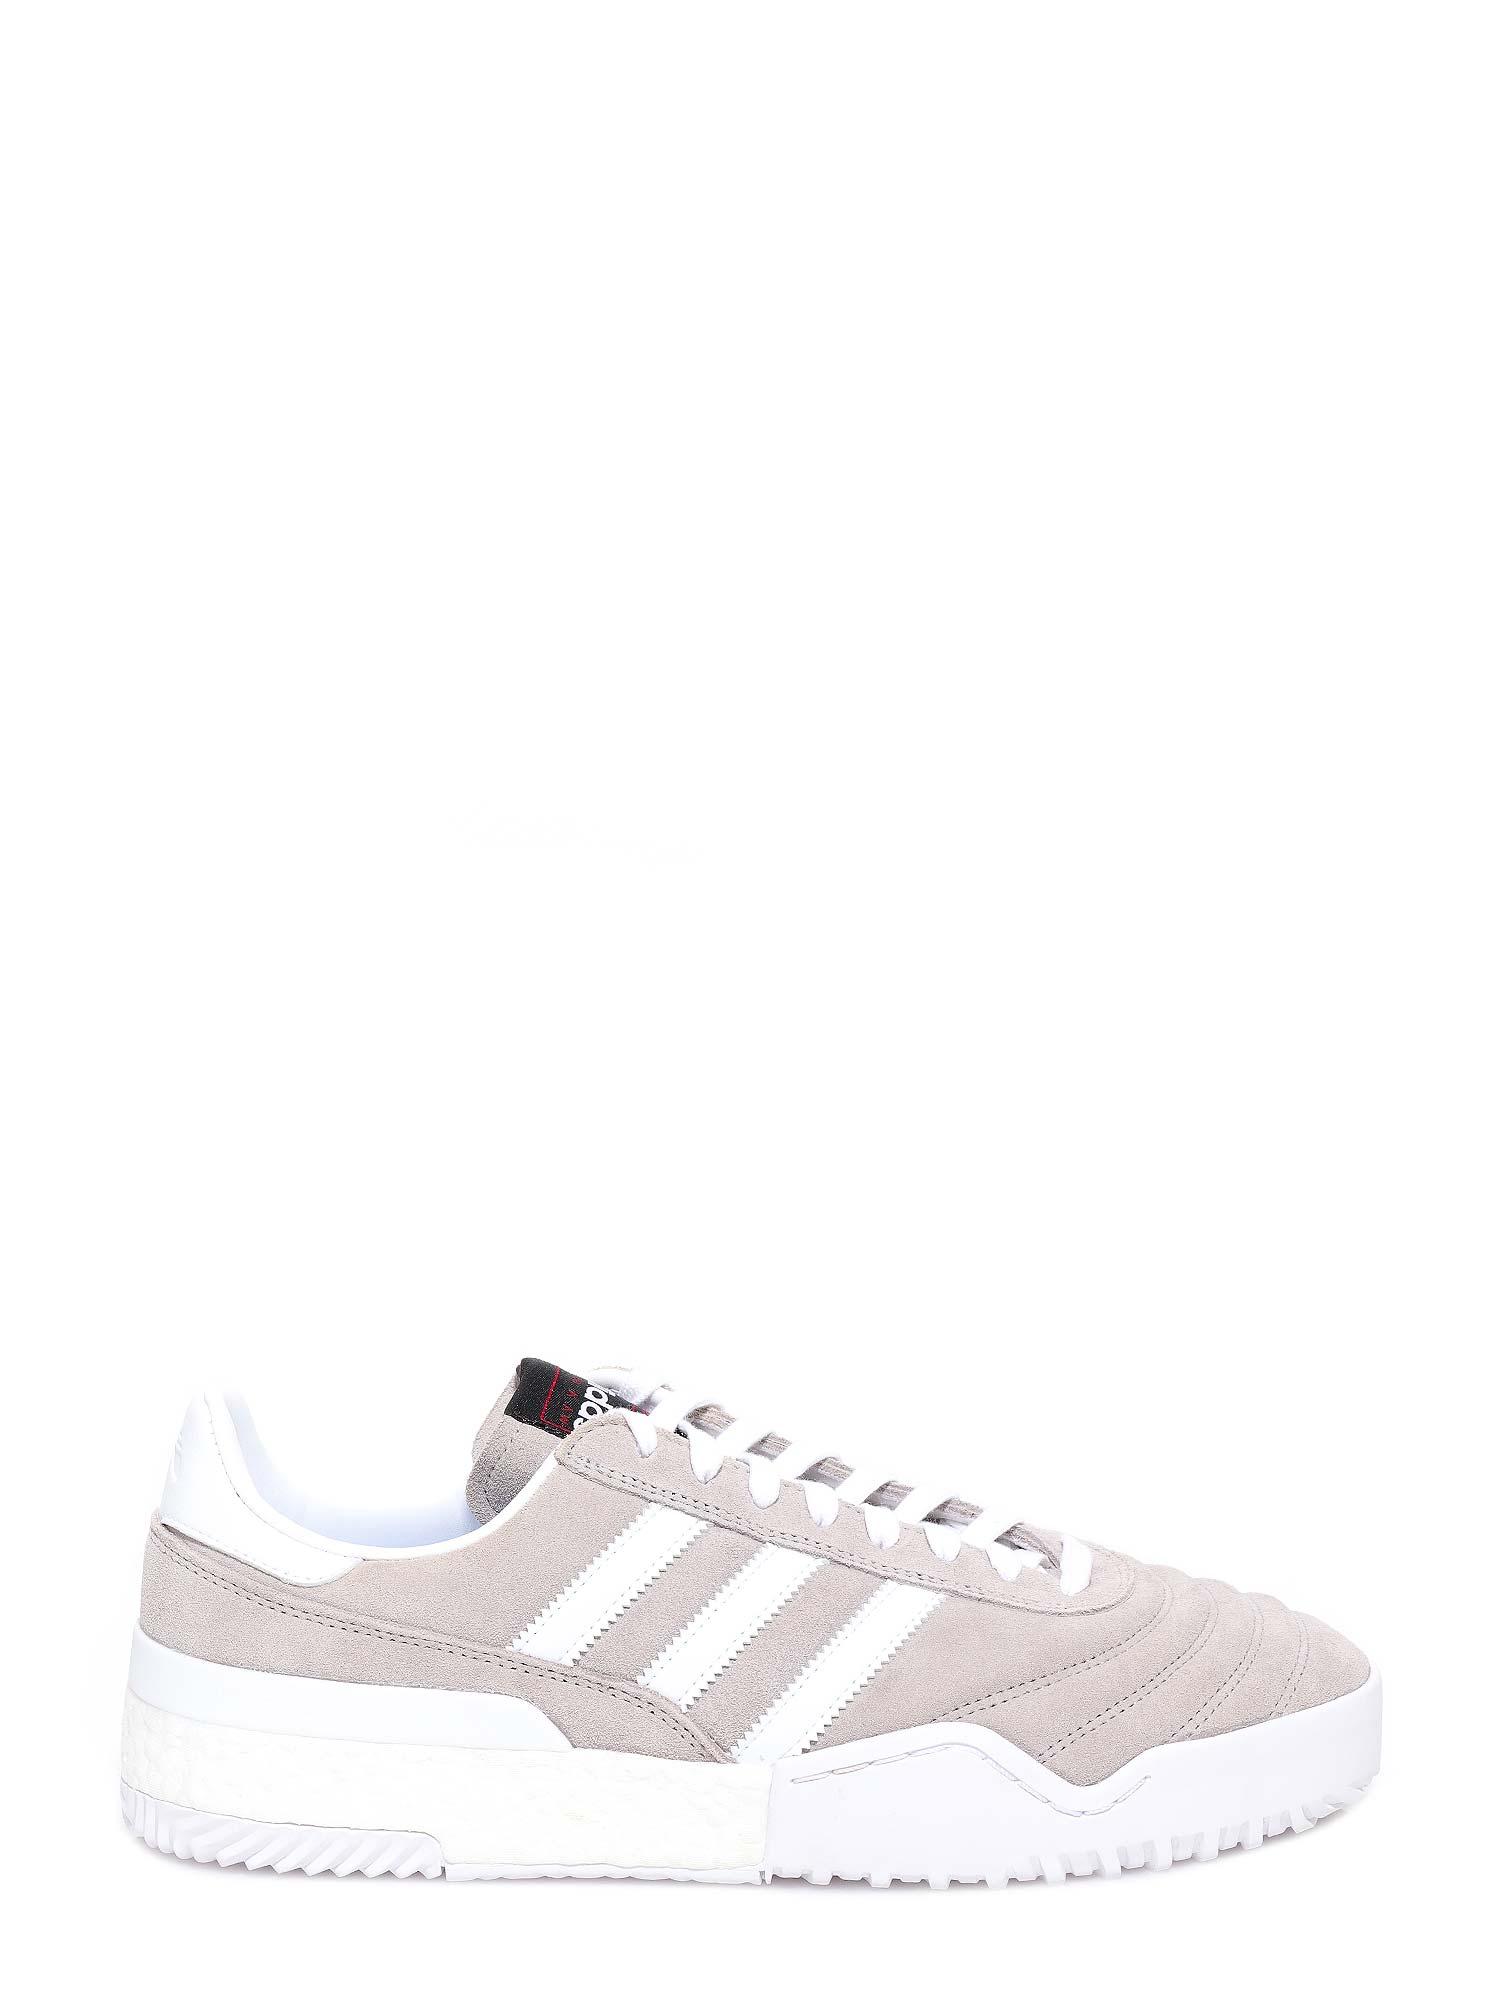 Adidas Originals by Alexander Wang Aw Bball Soccer Sneakers